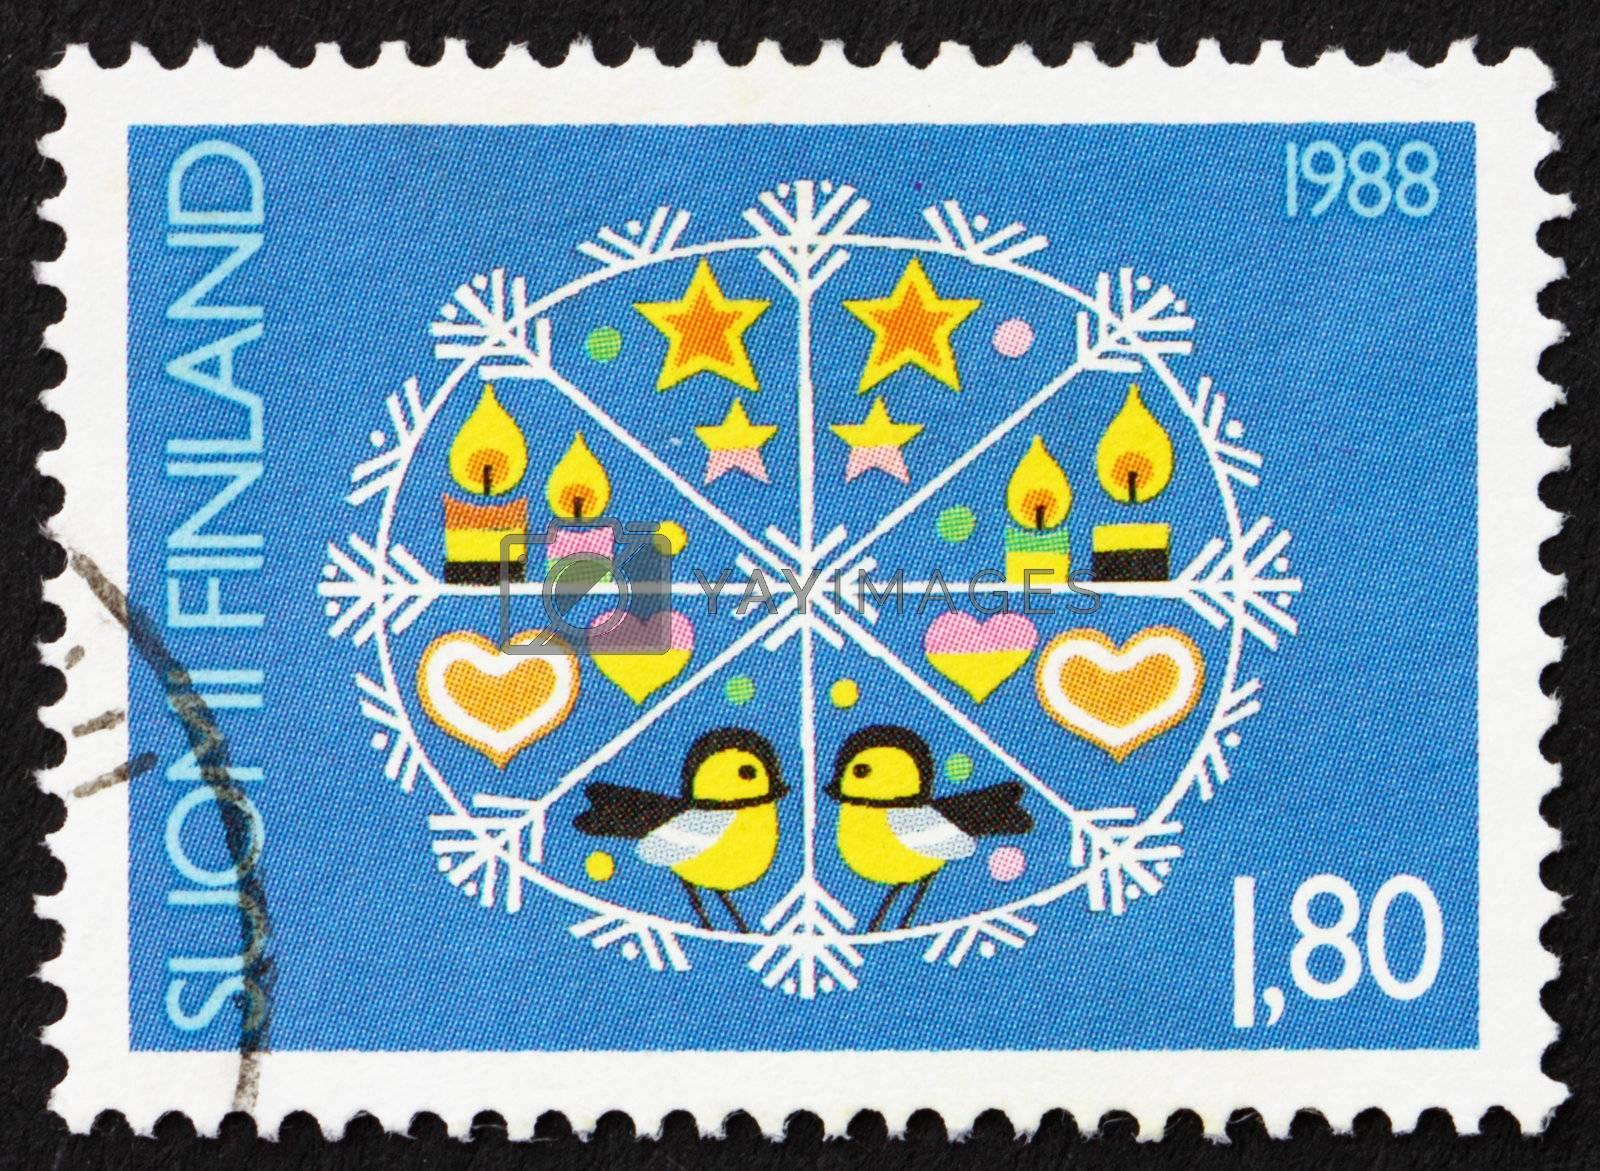 FINLAND - CIRCA 1988: a stamp printed in the Finland shows Christmas Design, circa 1988